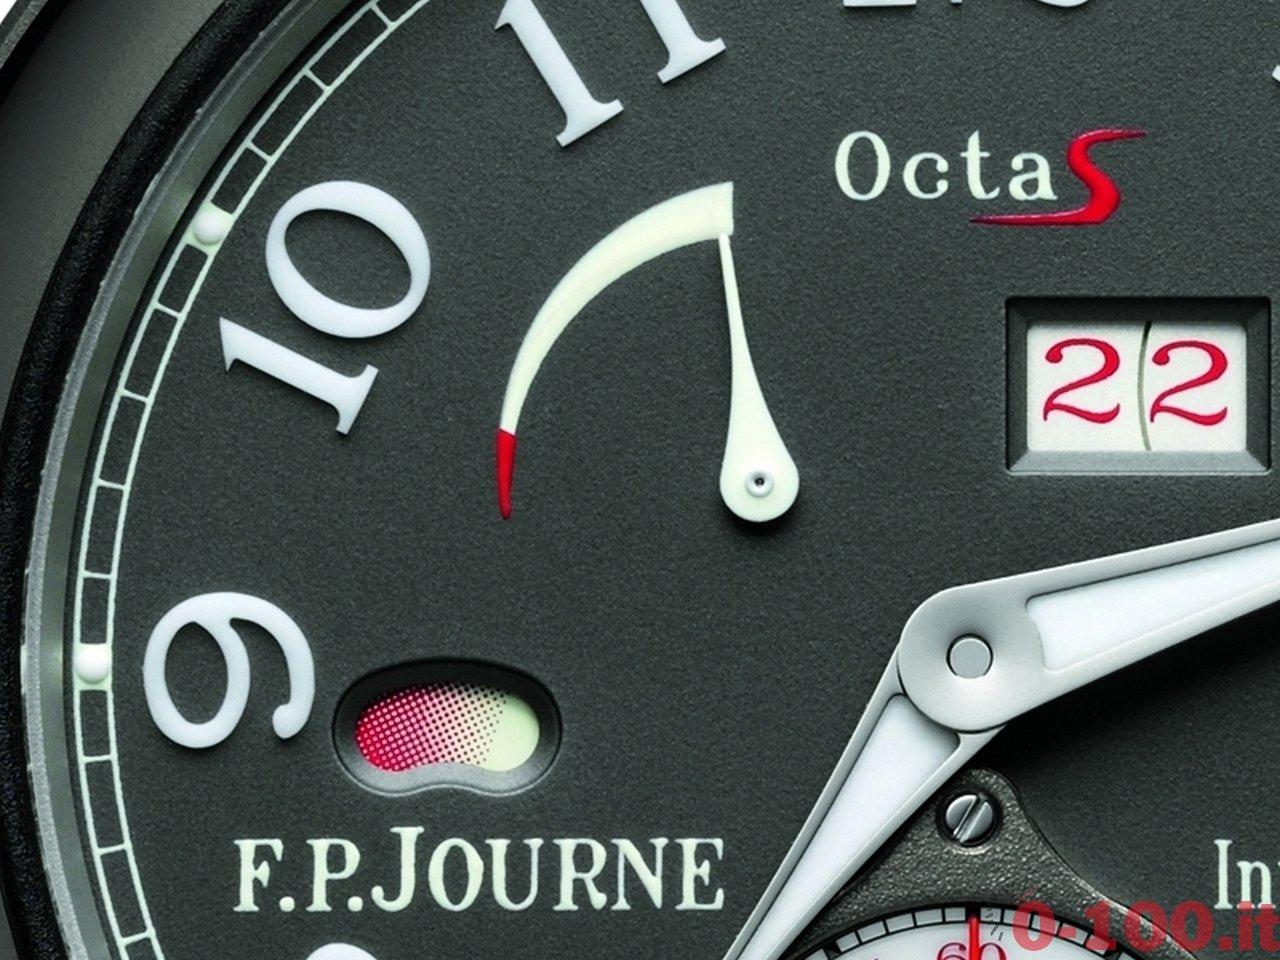 f-p-journe-octa-sport-titanium-prezzo-price-0-100_4